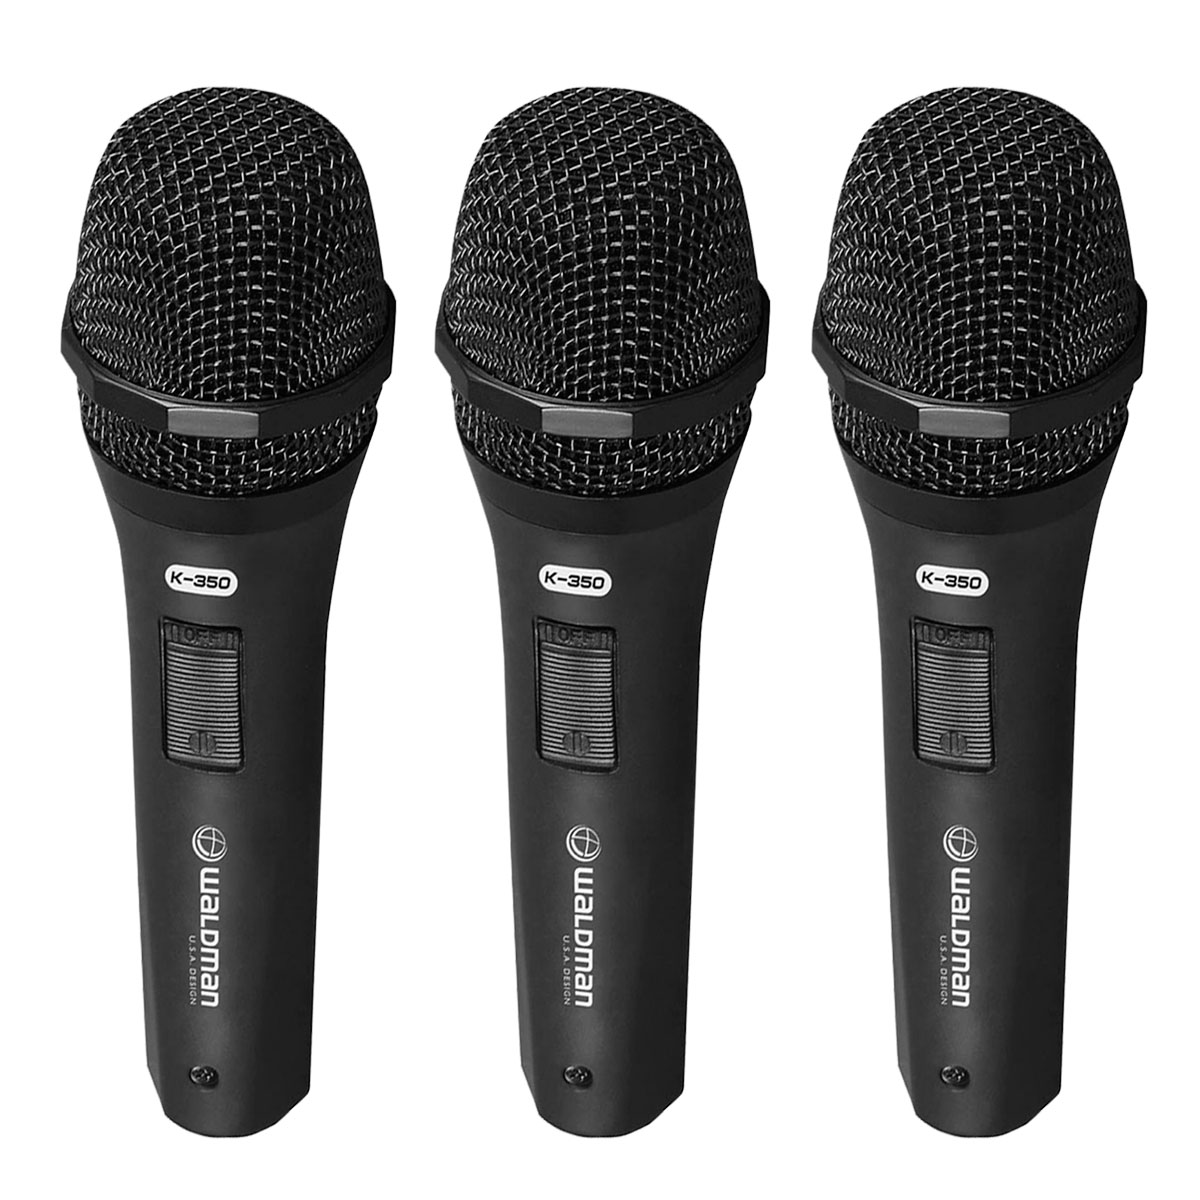 K3503PC - Kit 3 Microfones c/ Fio de M�o K 350 3 PC - Waldman